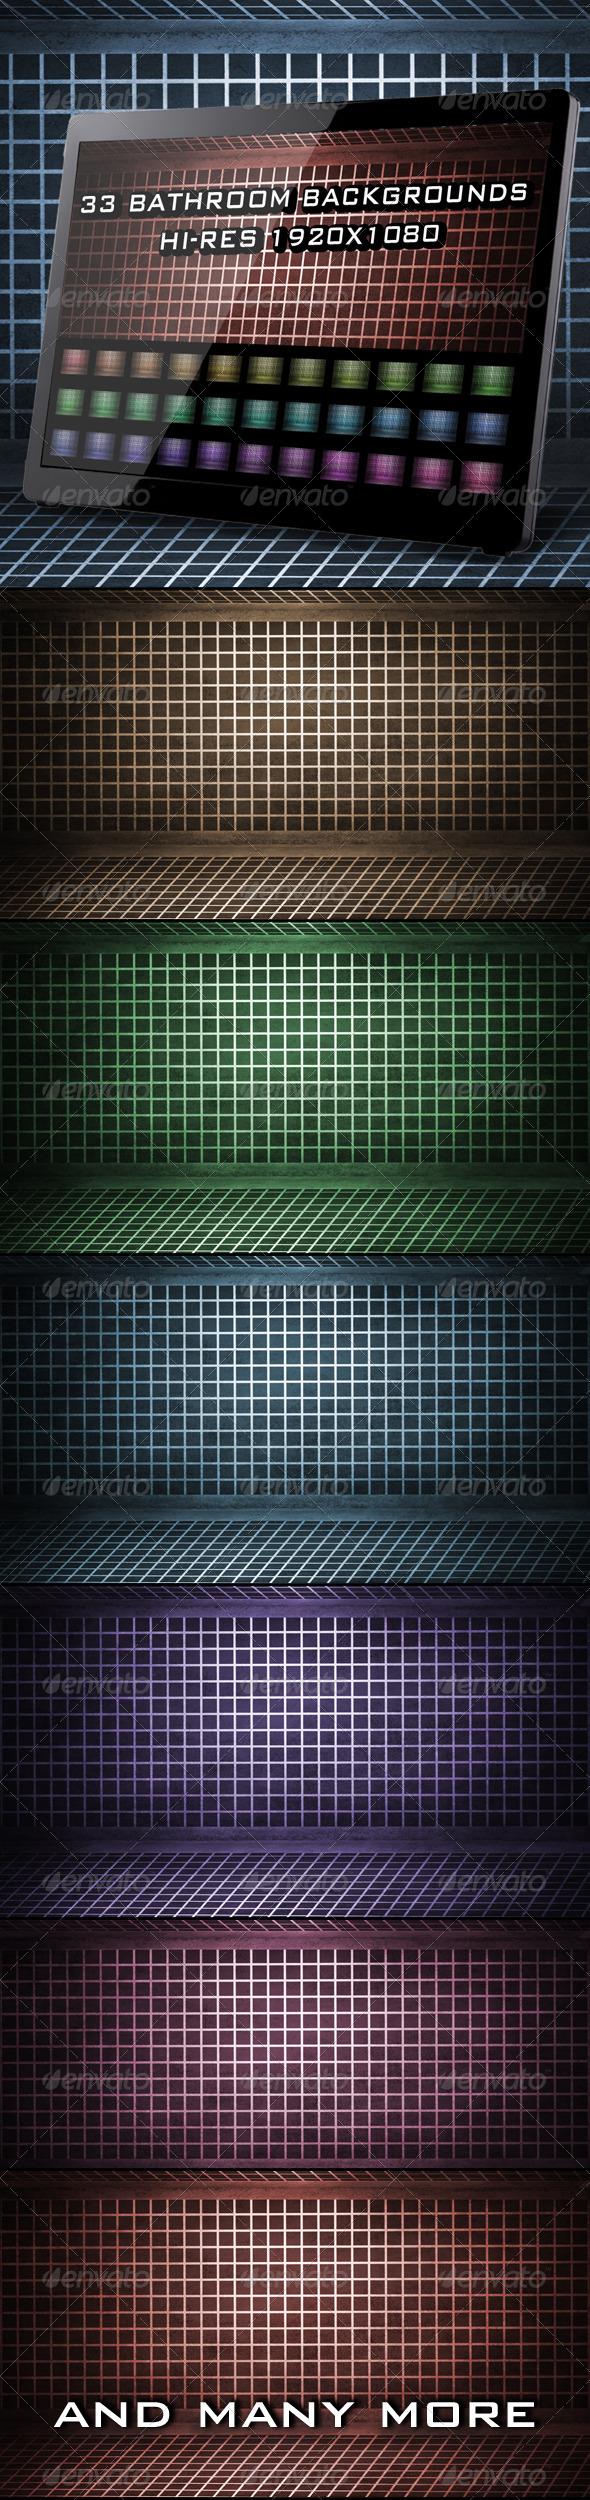 GraphicRiver 33 Bathroom Backgrounds 4099501